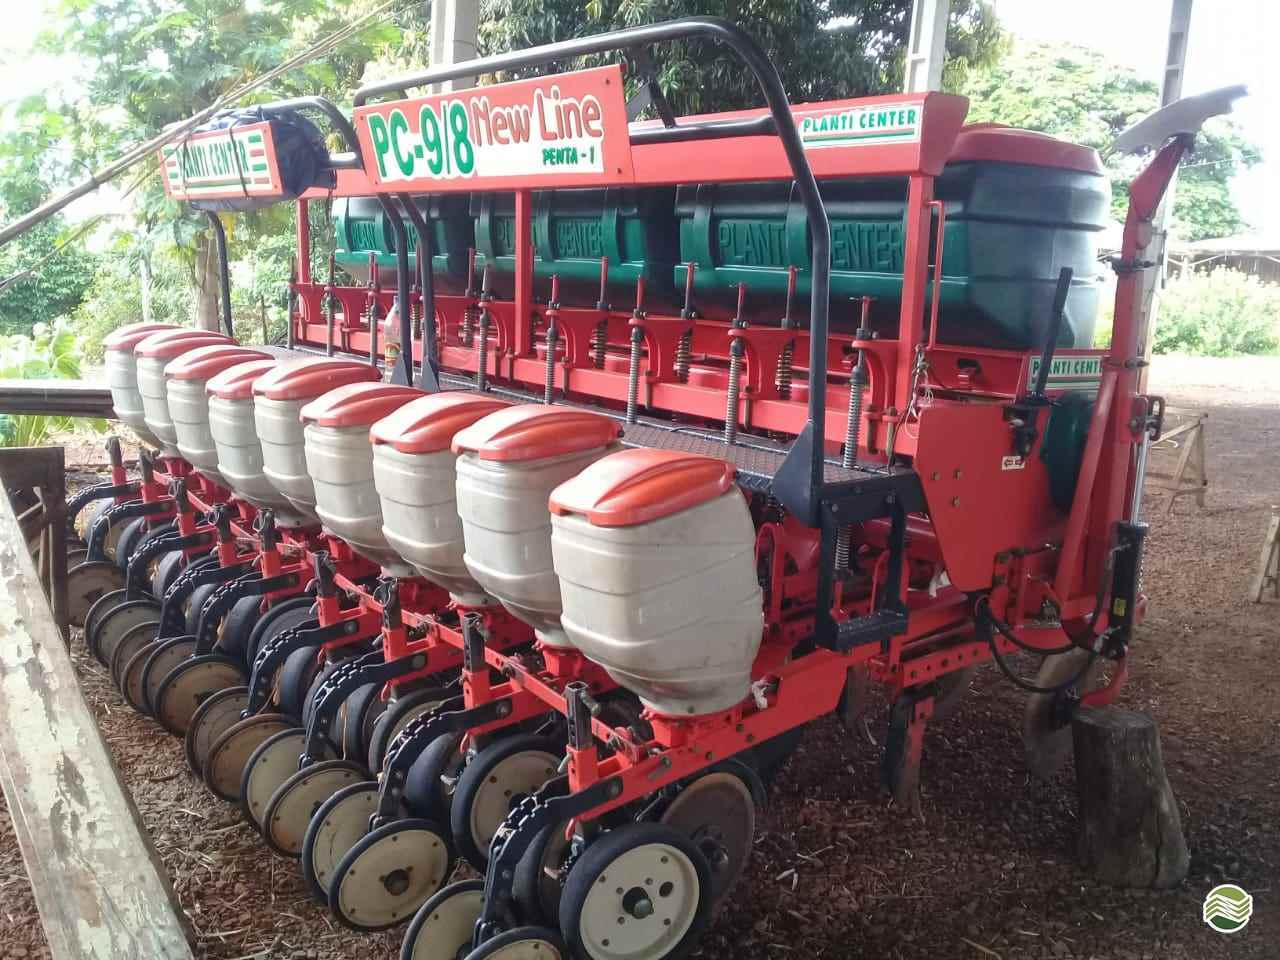 NEW LINE PC 9 de Rural Vendas - TERRA ROXA/PR